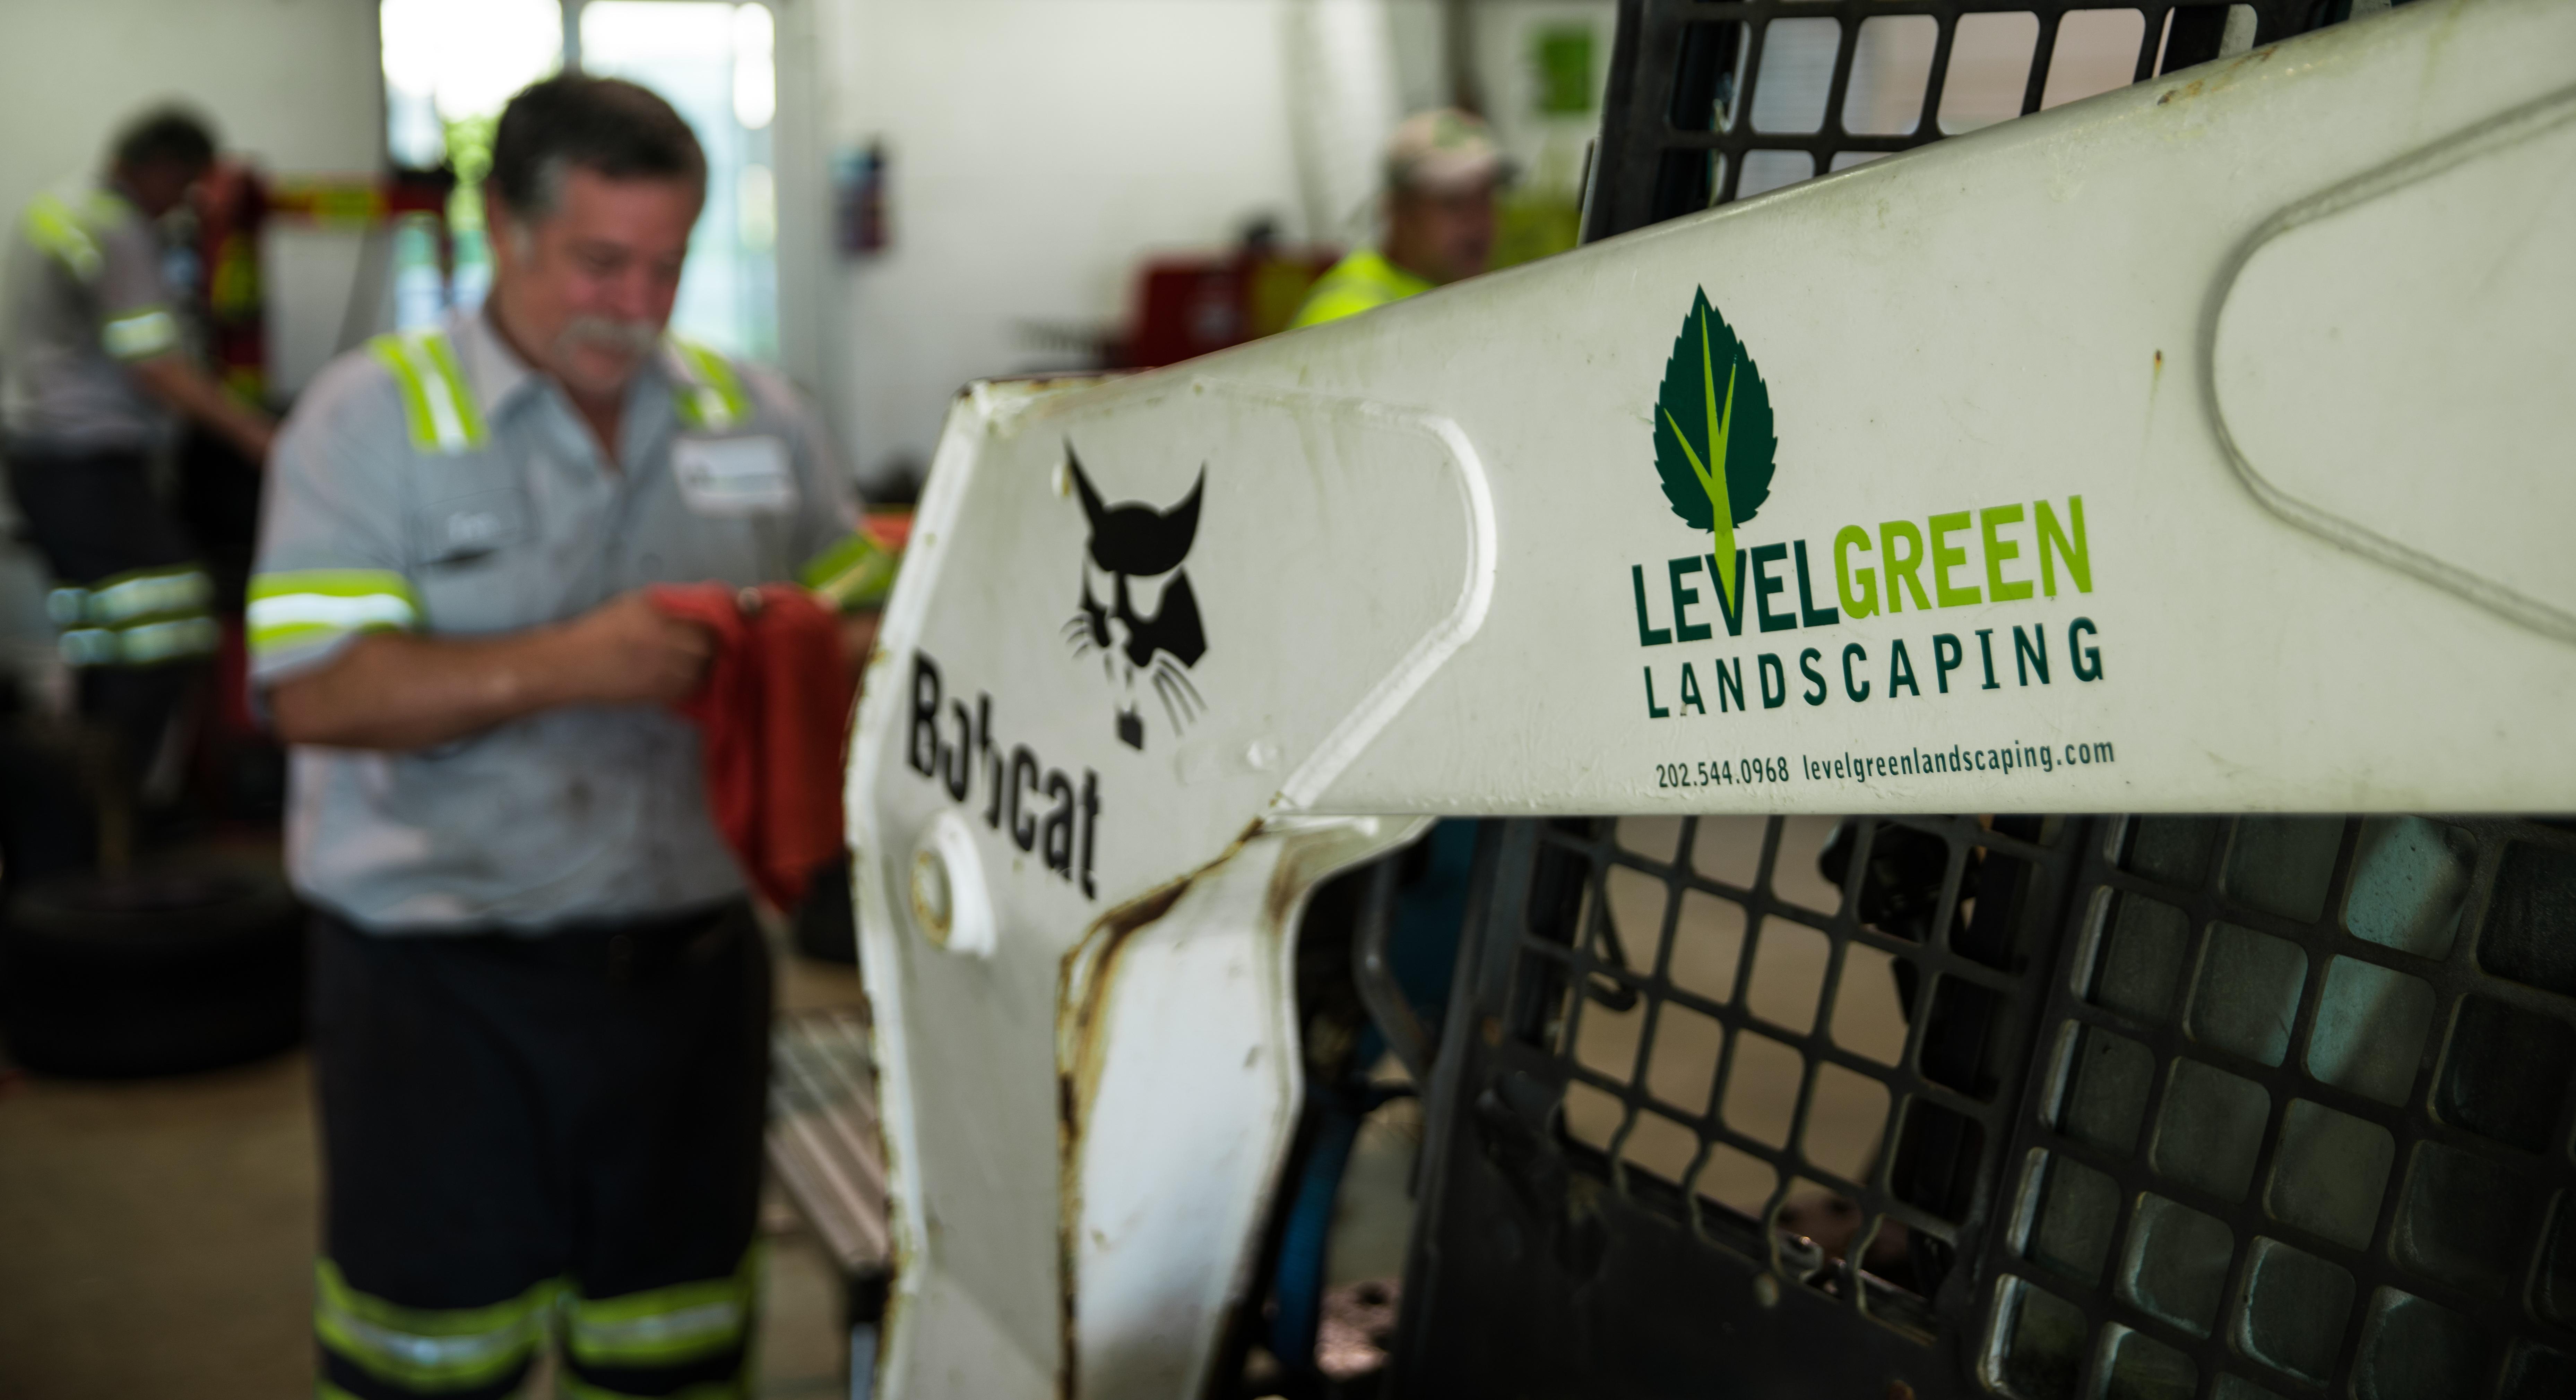 equipment-landscaping-company-logo.jpg